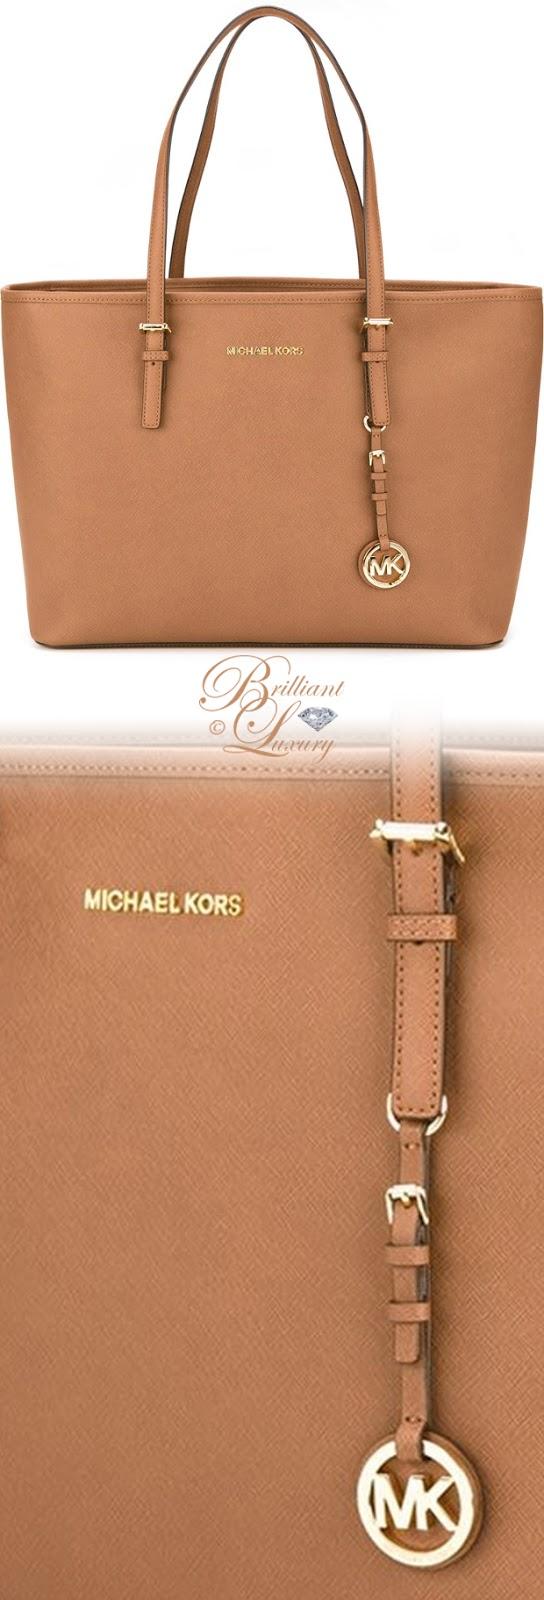 Brilliant Luxury ♦ Michael Michael Kors Medium 'Jet Set Travel' Tote